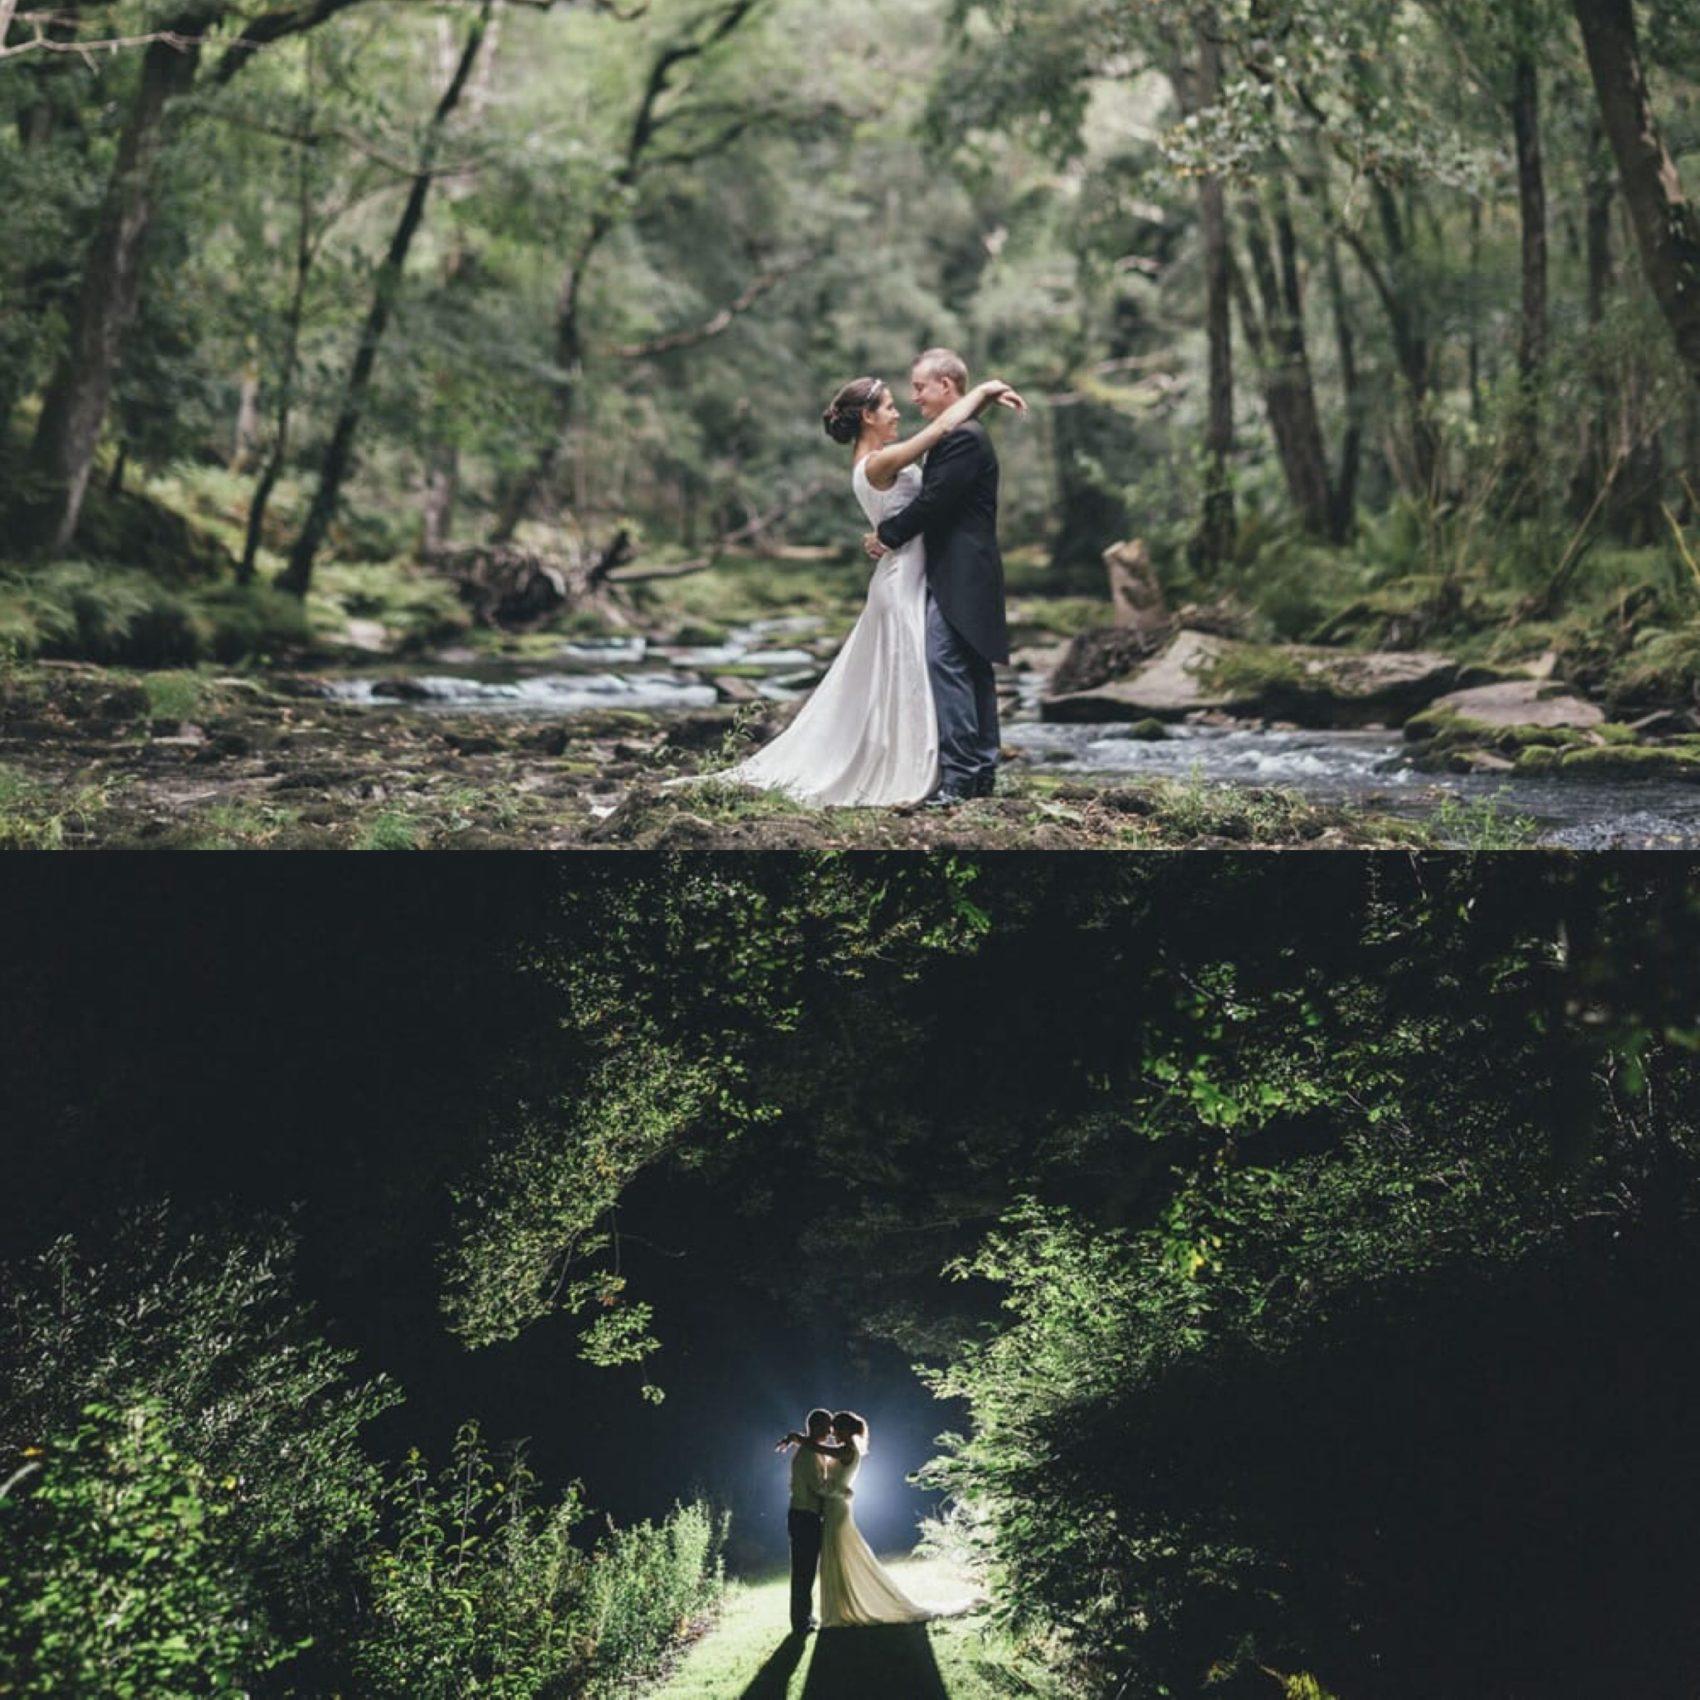 Woodland, moody, night, lighting, light, silhouette, river, wedding, bride & groom, ever after, lower grenofen, moonlight,